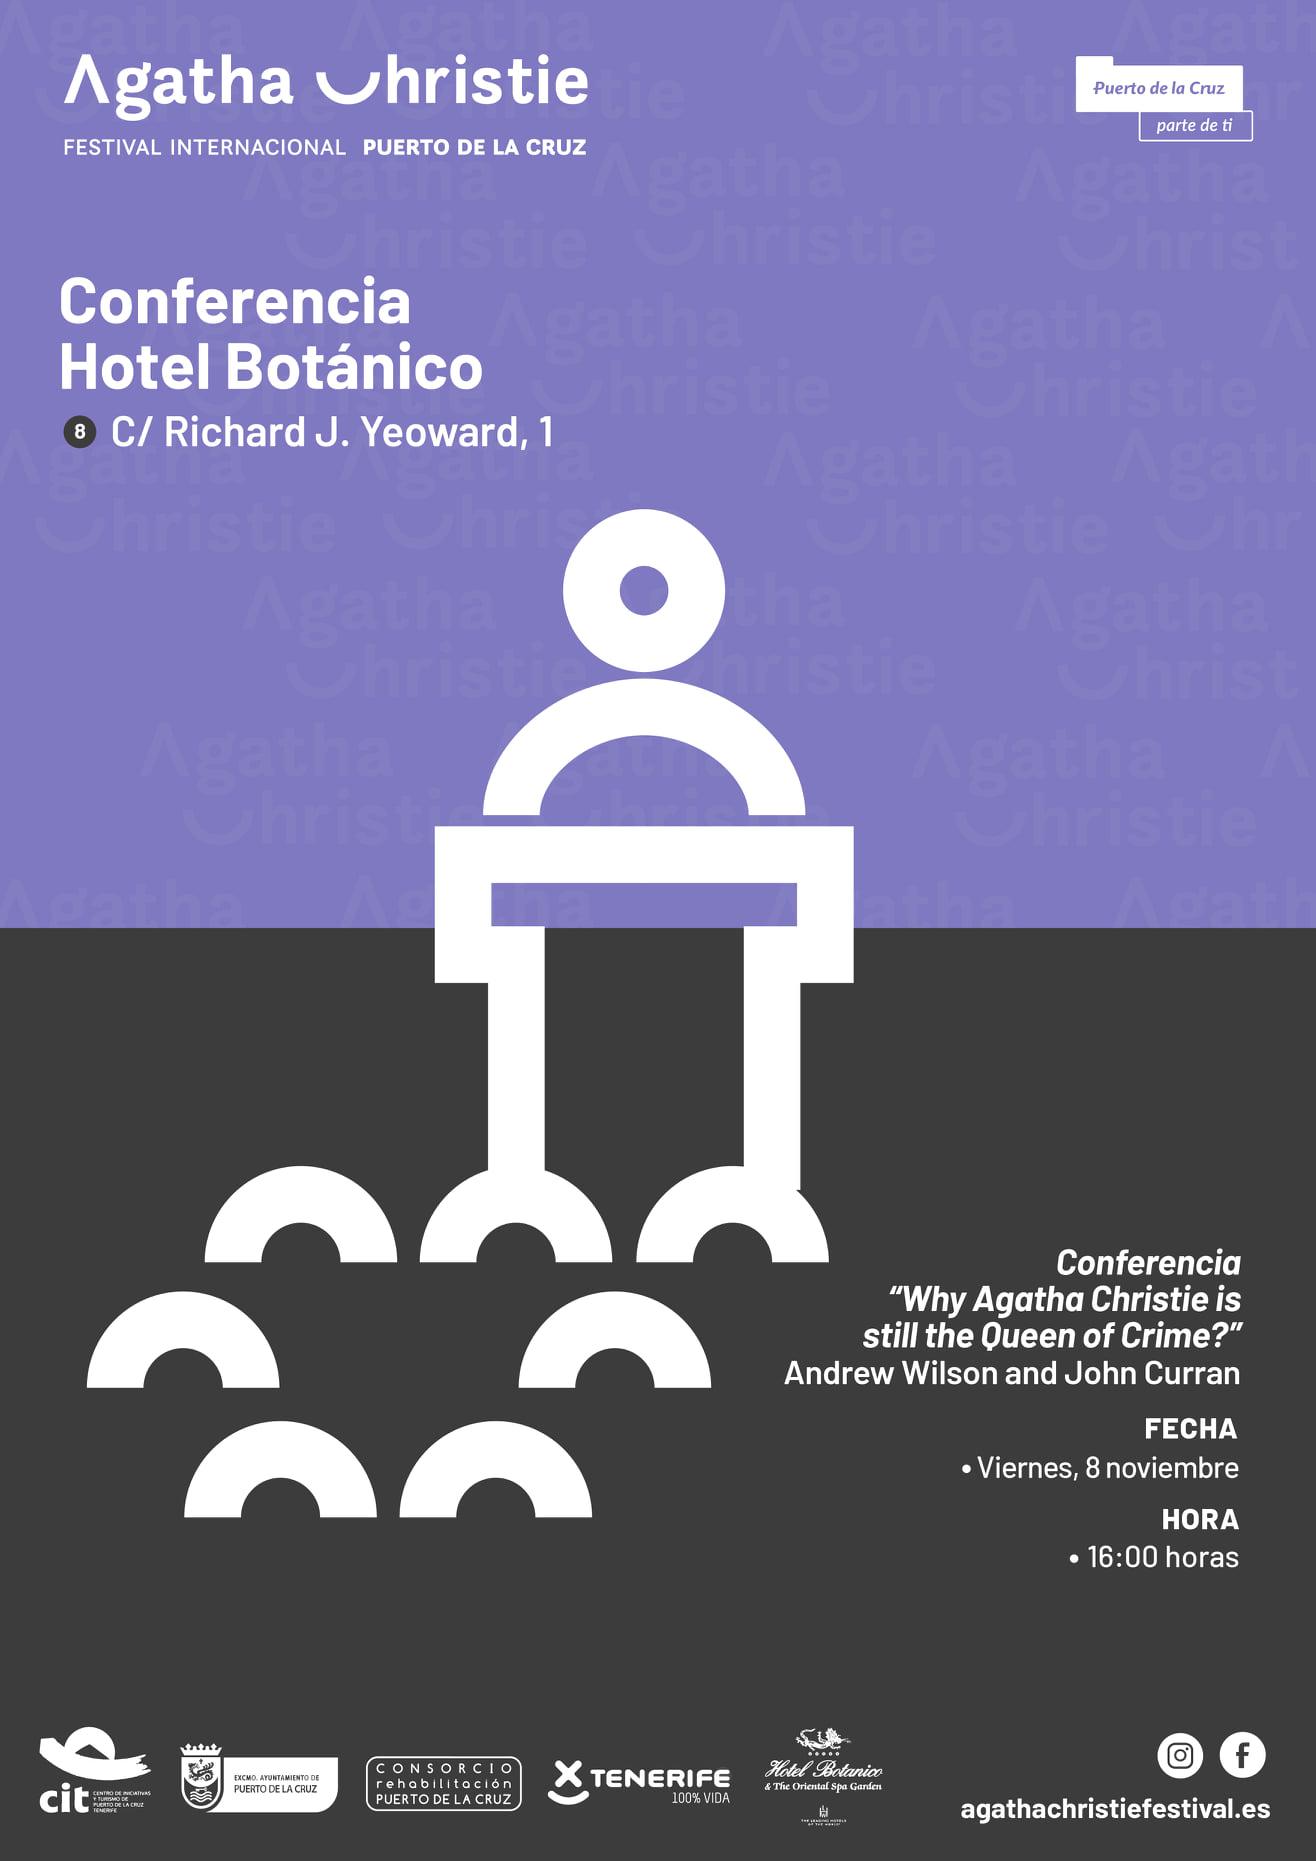 Botanical Hotel Conference